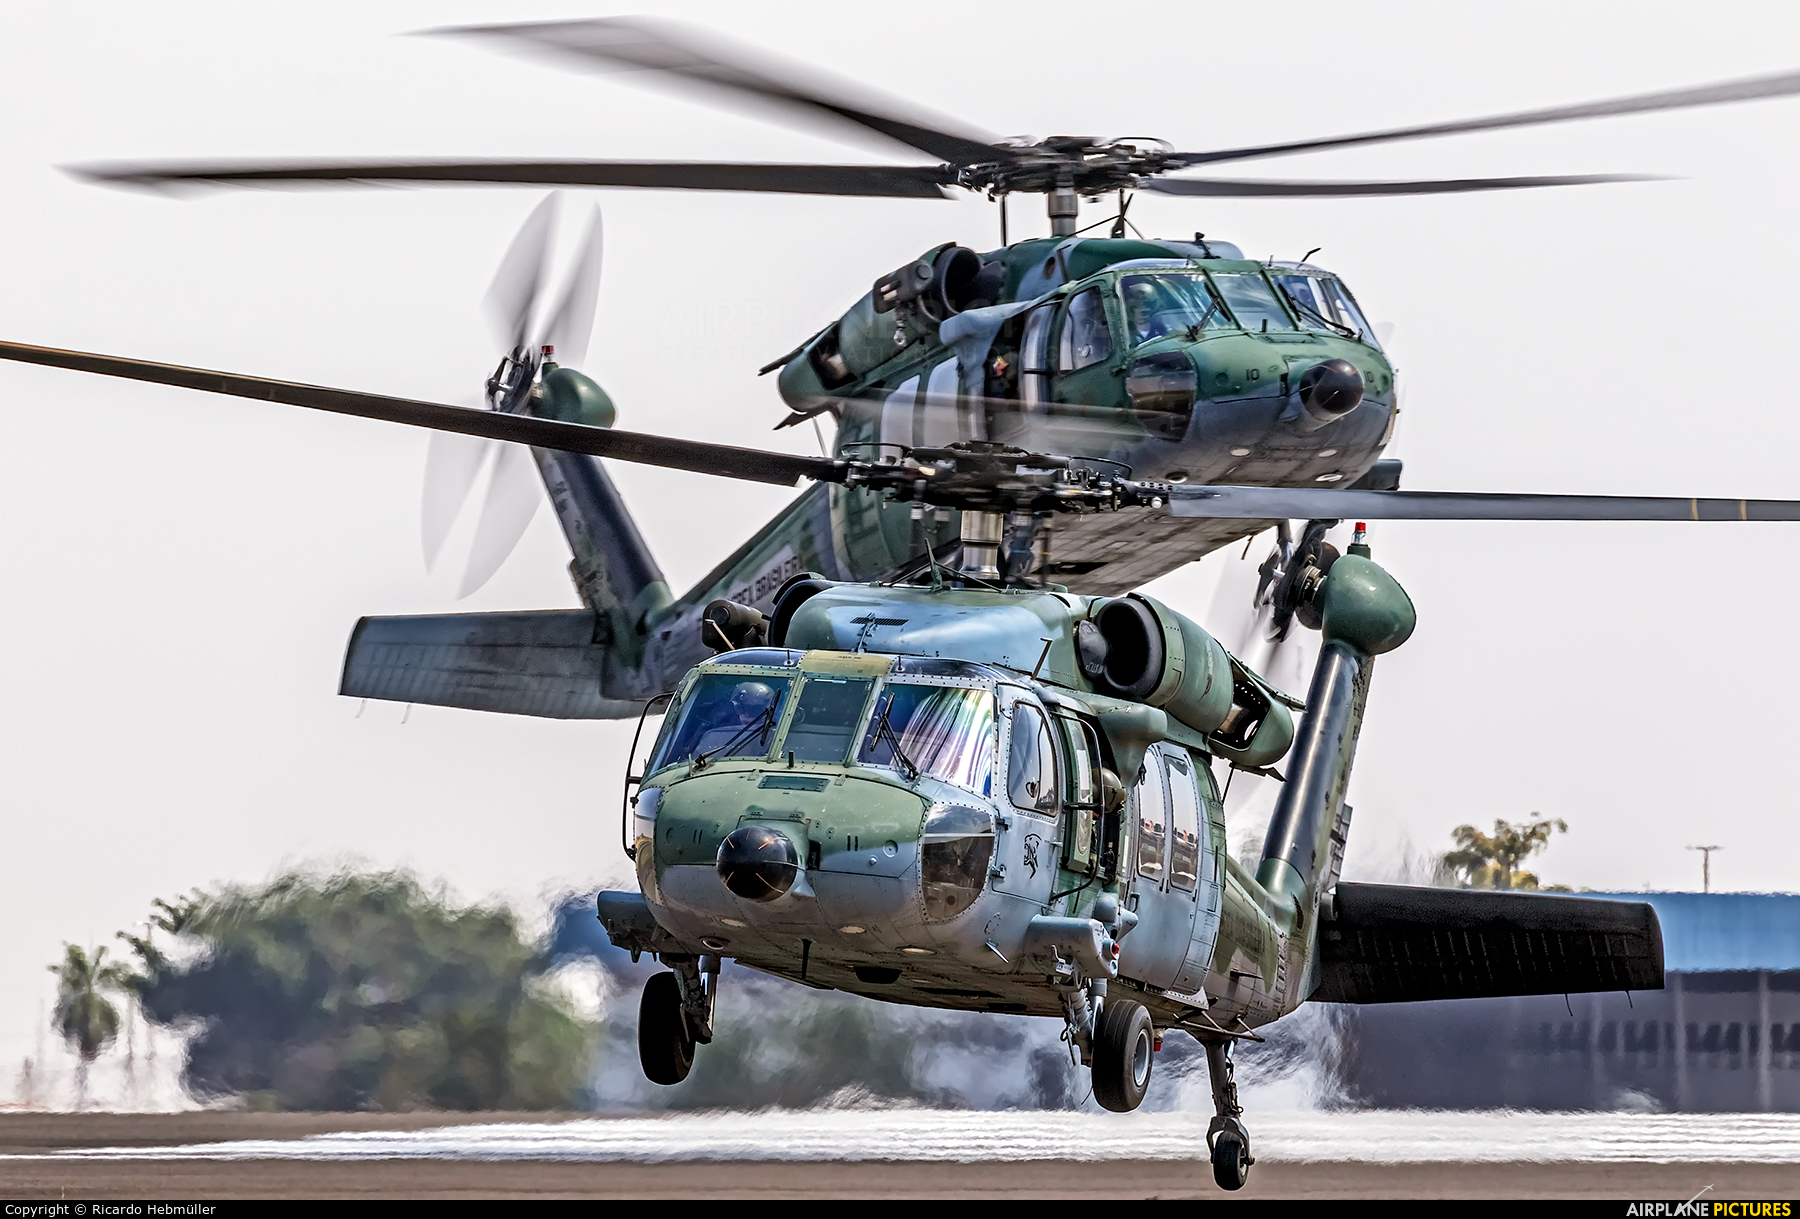 Brazil - Air Force 8911 aircraft at Campo Grande